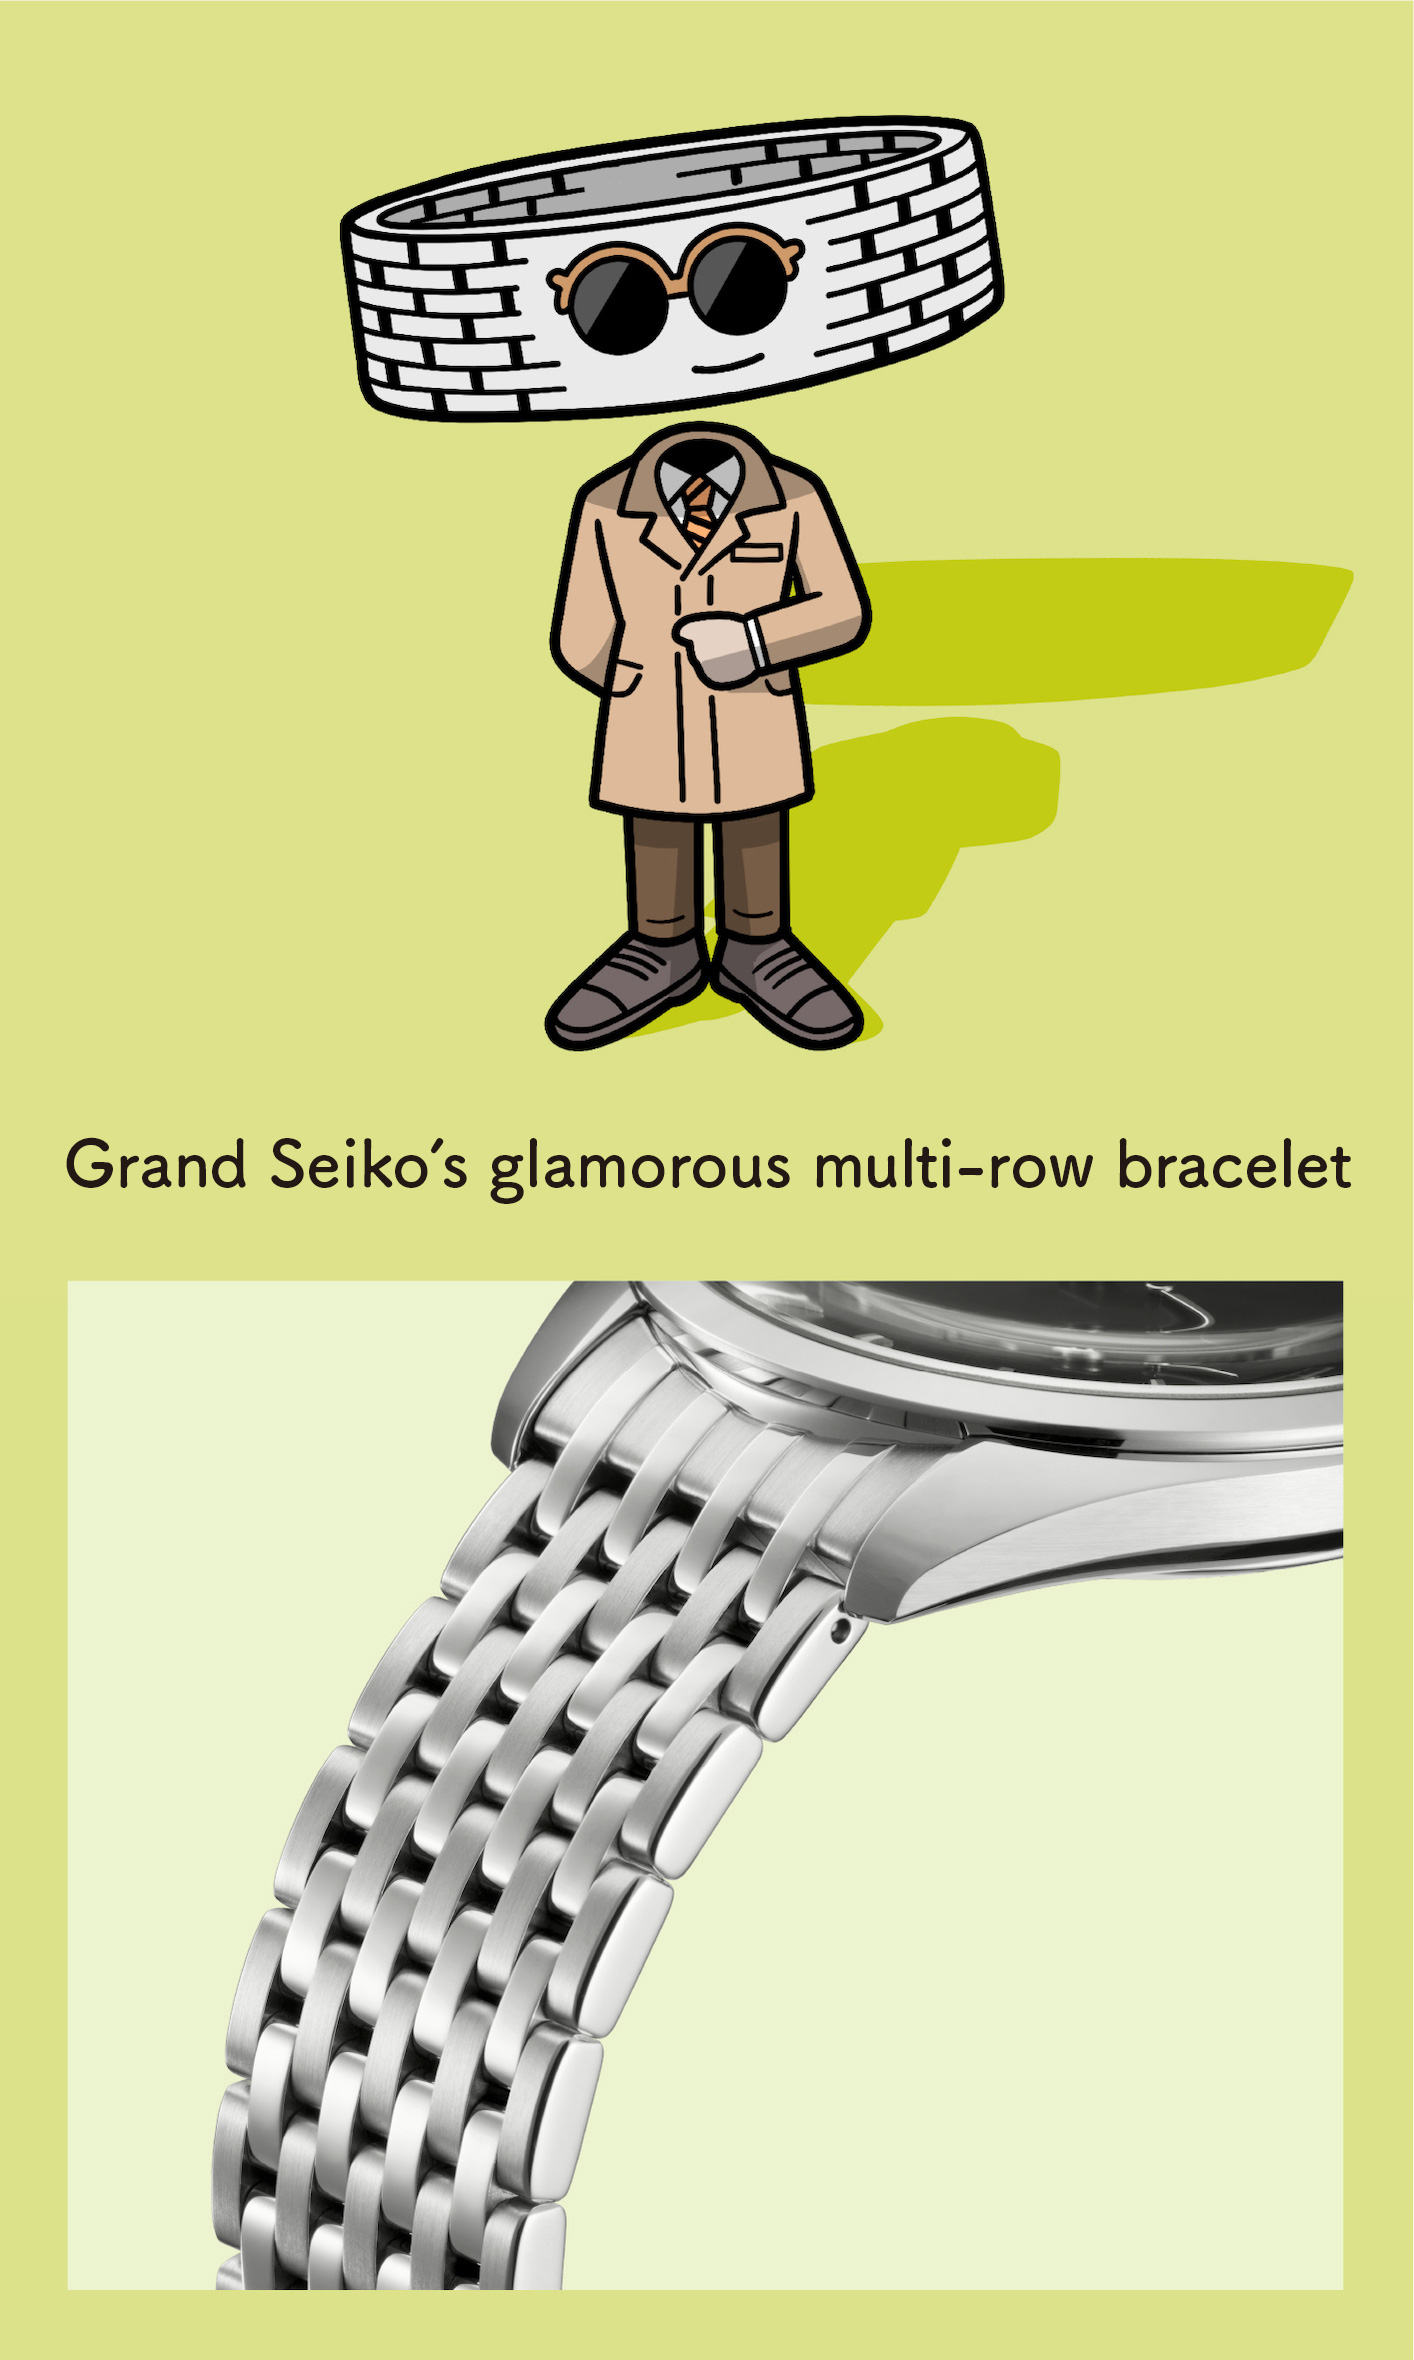 Grand Seiko's glamorous multi-row bracelet (Enlarged photo of the bracelet)